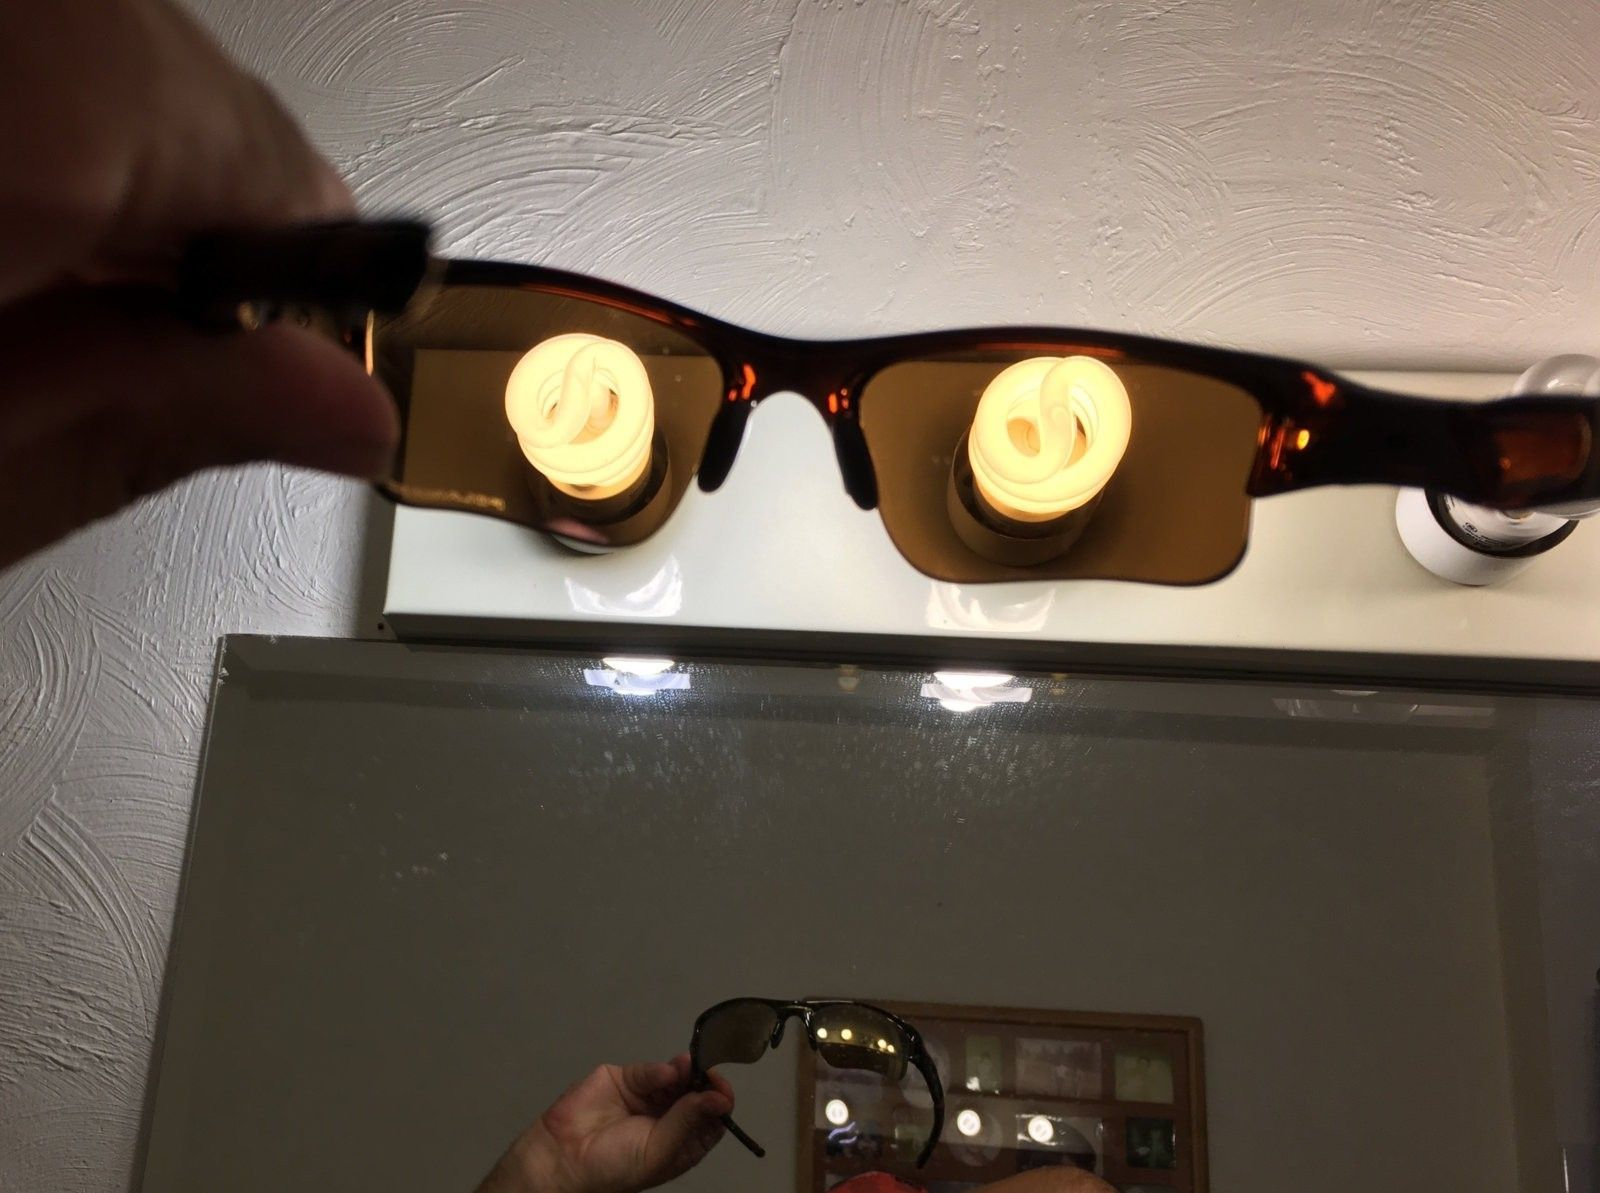 Flak Jacket 1.0 - 2 pairs - Polarized lenses - 2016-07-07 19.24.51.jpg